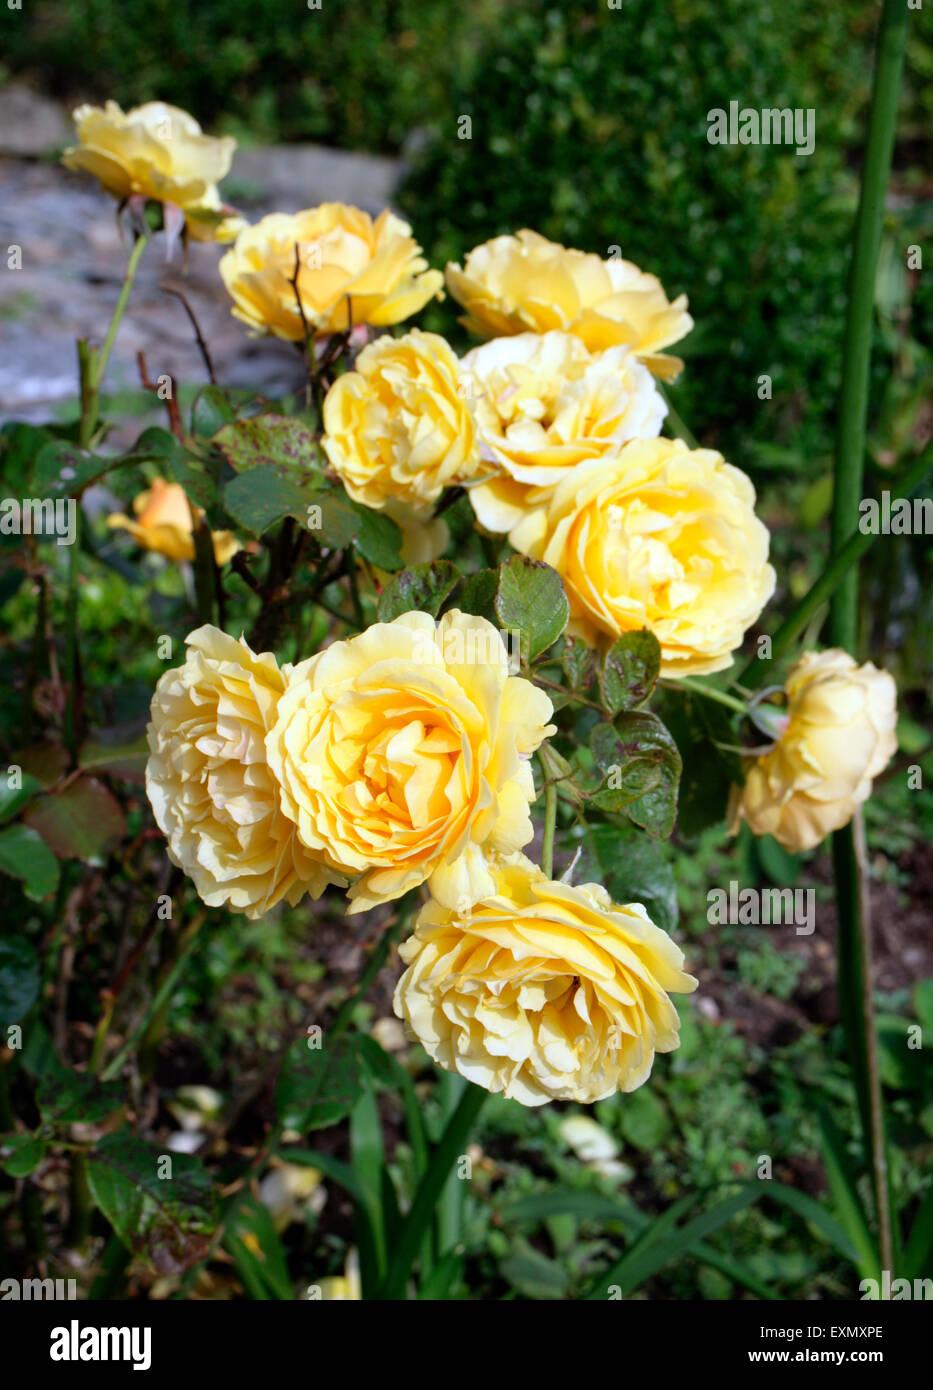 Yellow flower carpet rose stock photos yellow flower carpet rose rosa flower carpet yellow stock image mightylinksfo